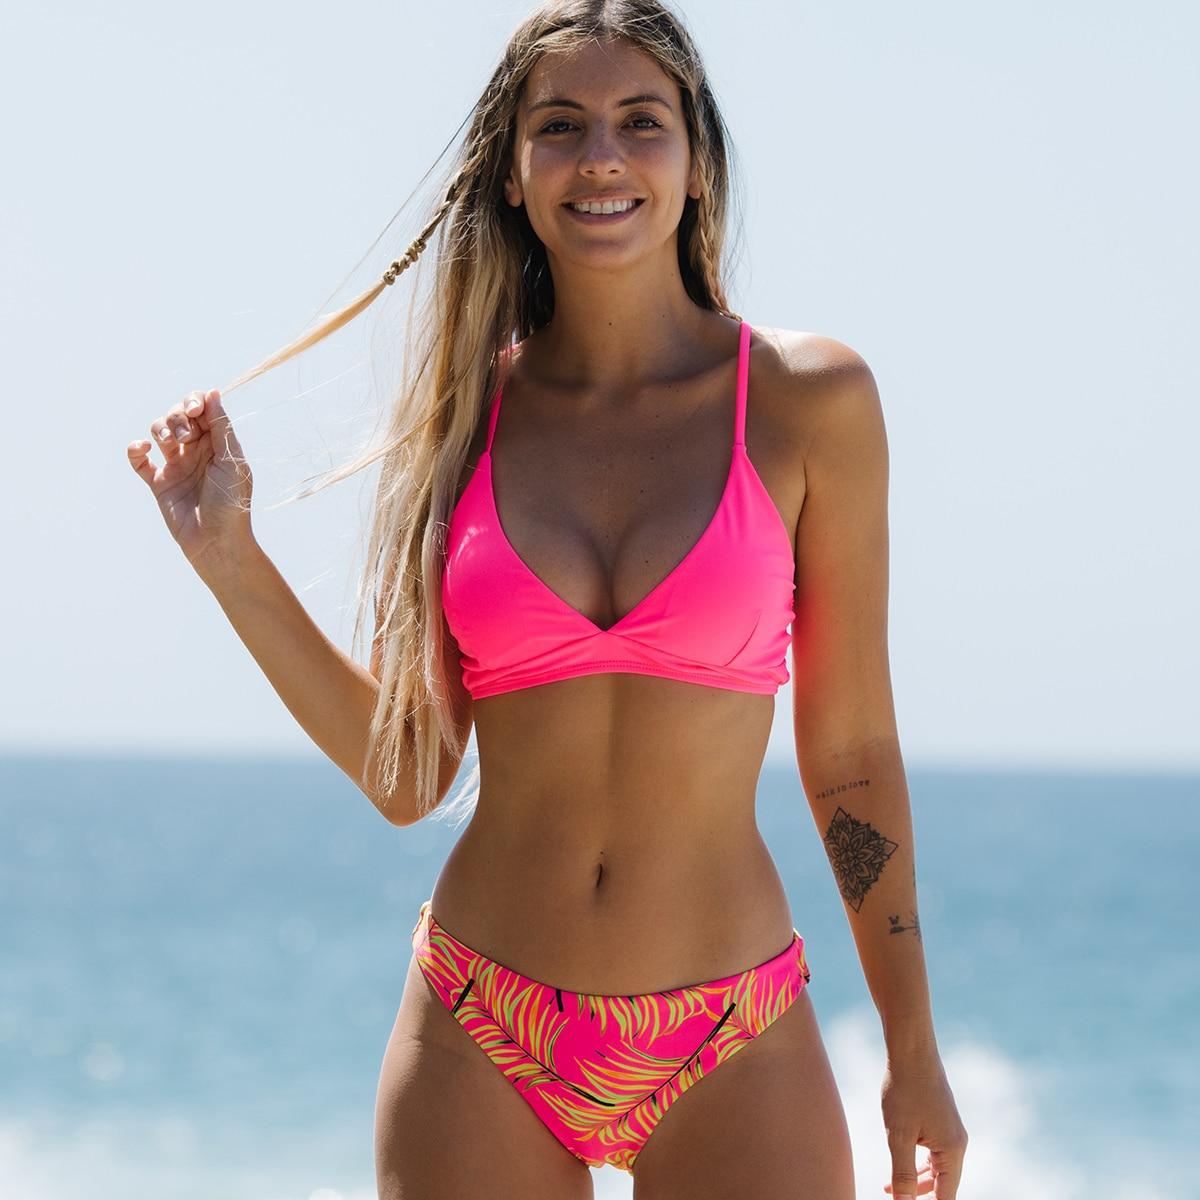 new knot printed low waist two pieces bikini set swimsuit female women beachwear swimwear bather bathing suit nybycacl 2021 New Pink Printed Low Waist Two Pieces Bikini Set Swimsuit Female Women Beachwear Swimwear Bather Bathing Suit